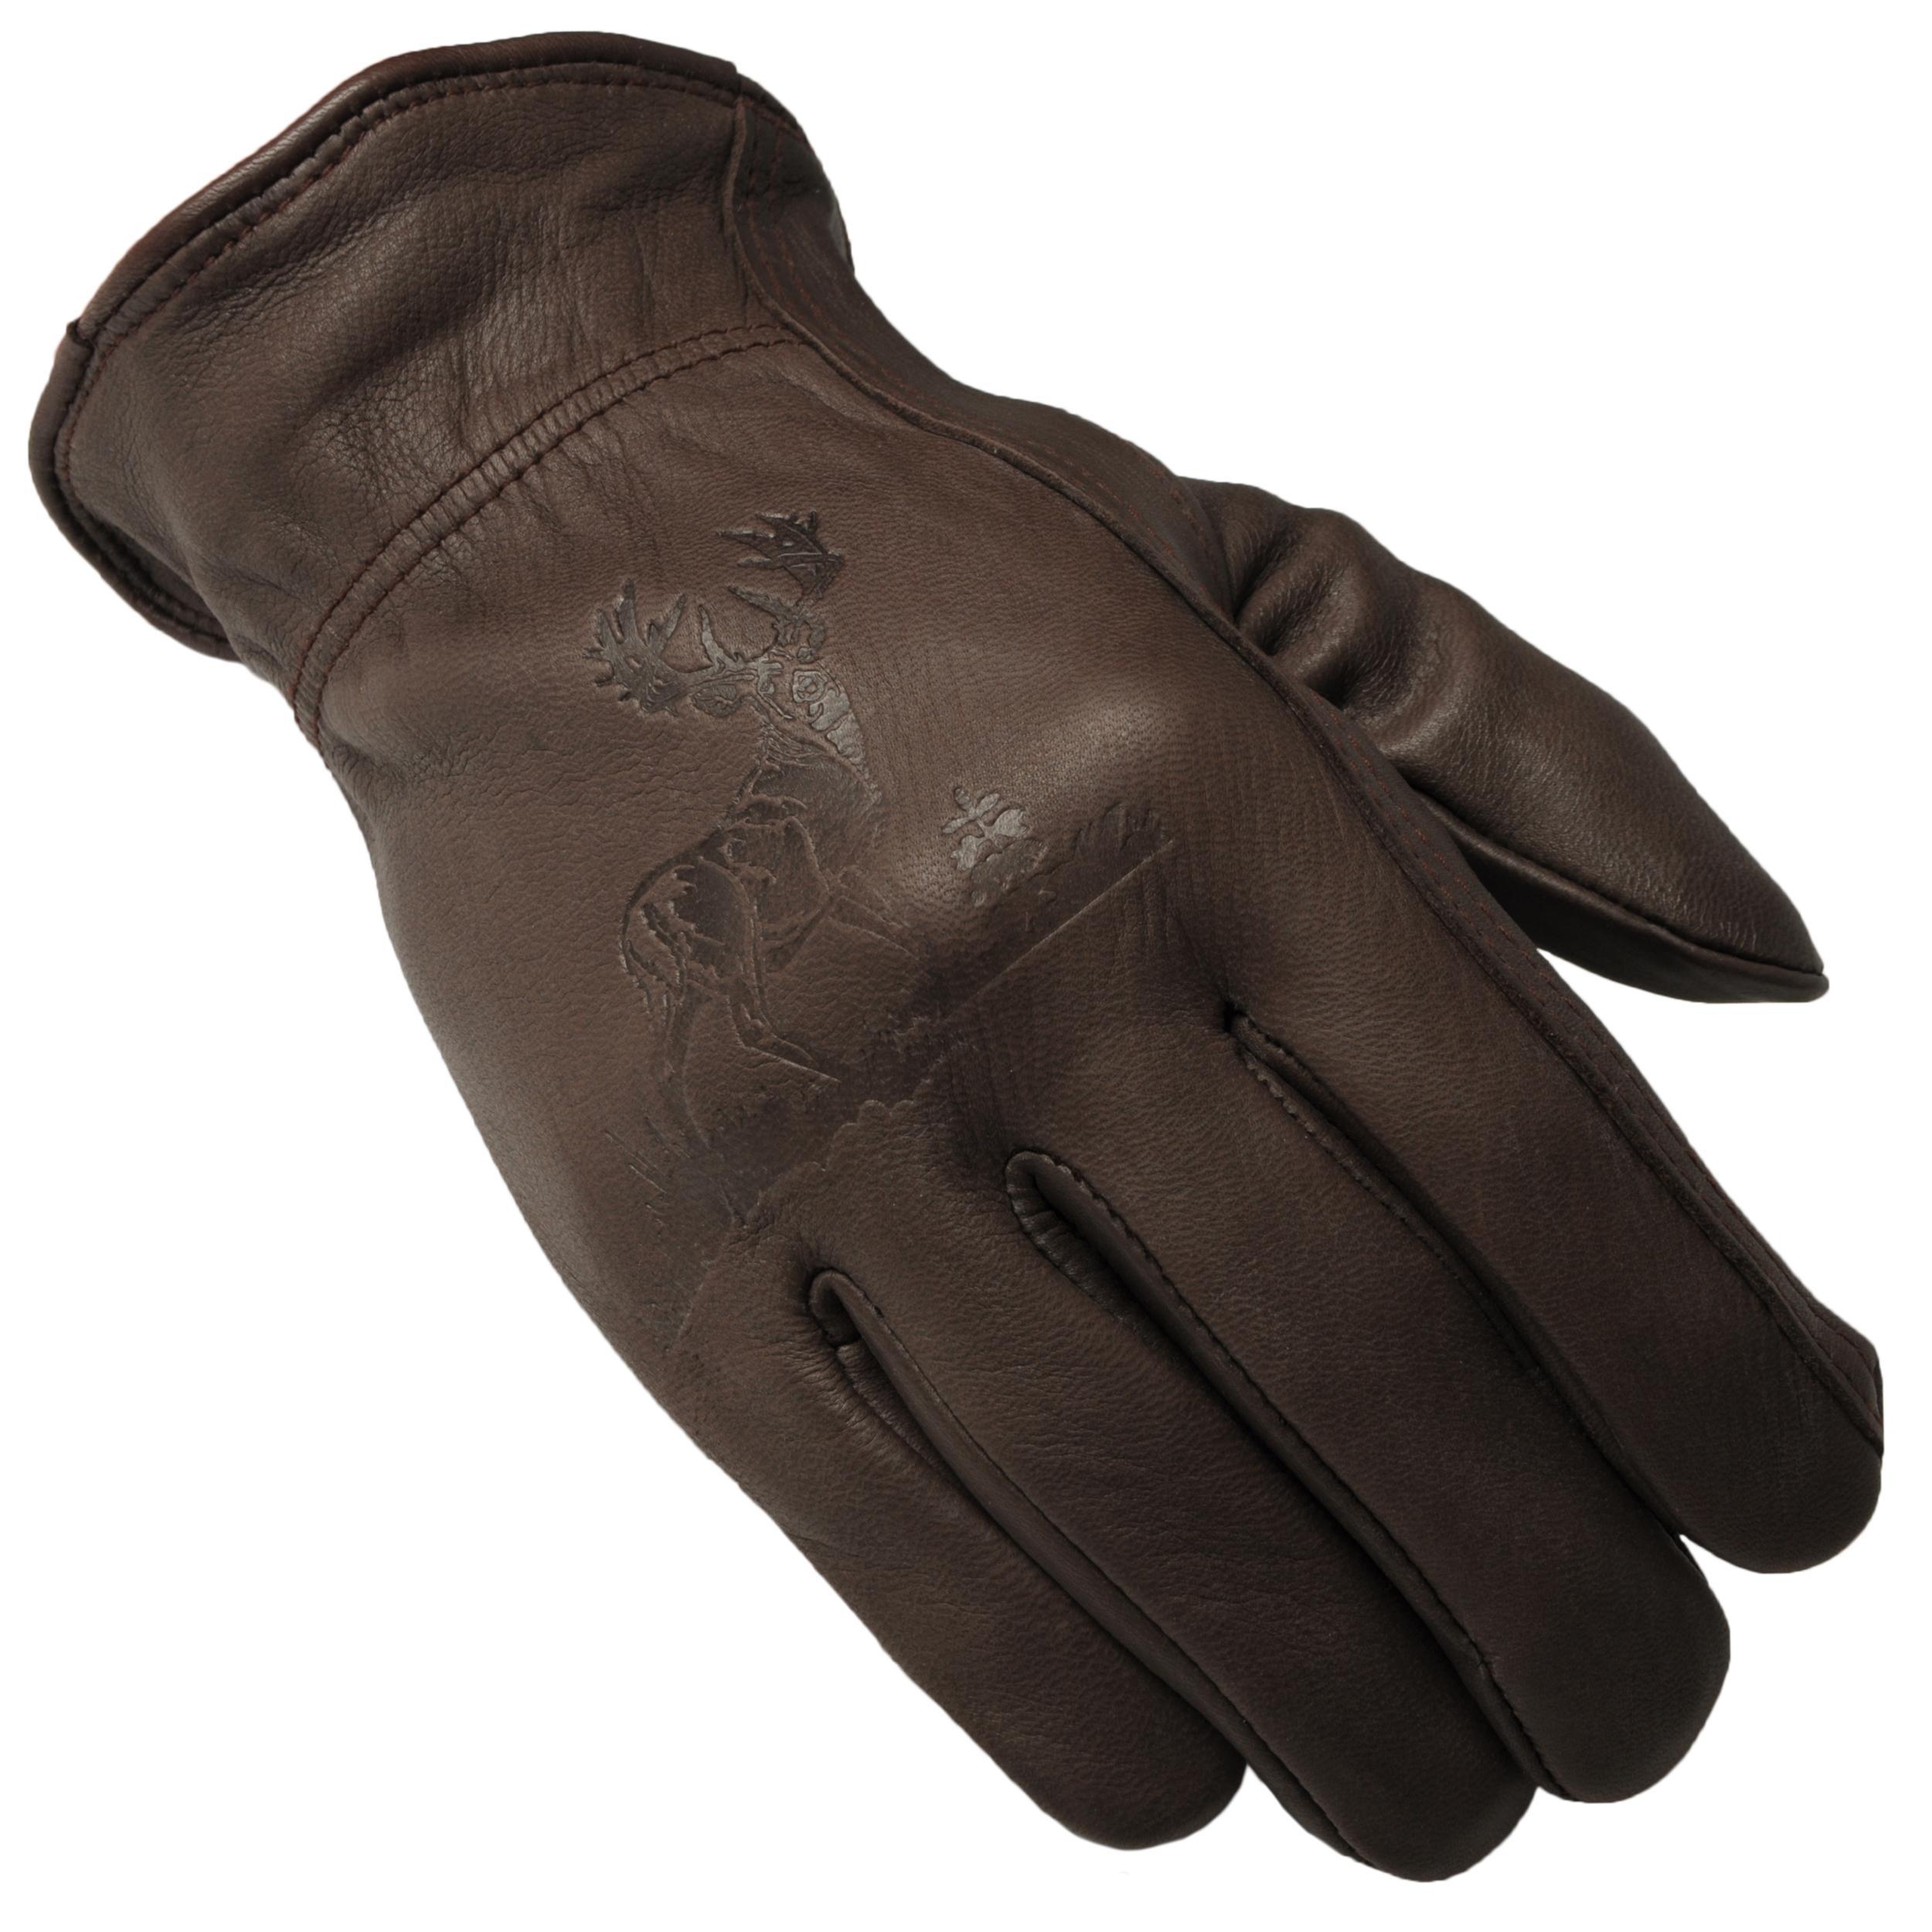 Daxx Men's Top Grain Deerskin Leather Whitetail Wildlife Print Gloves